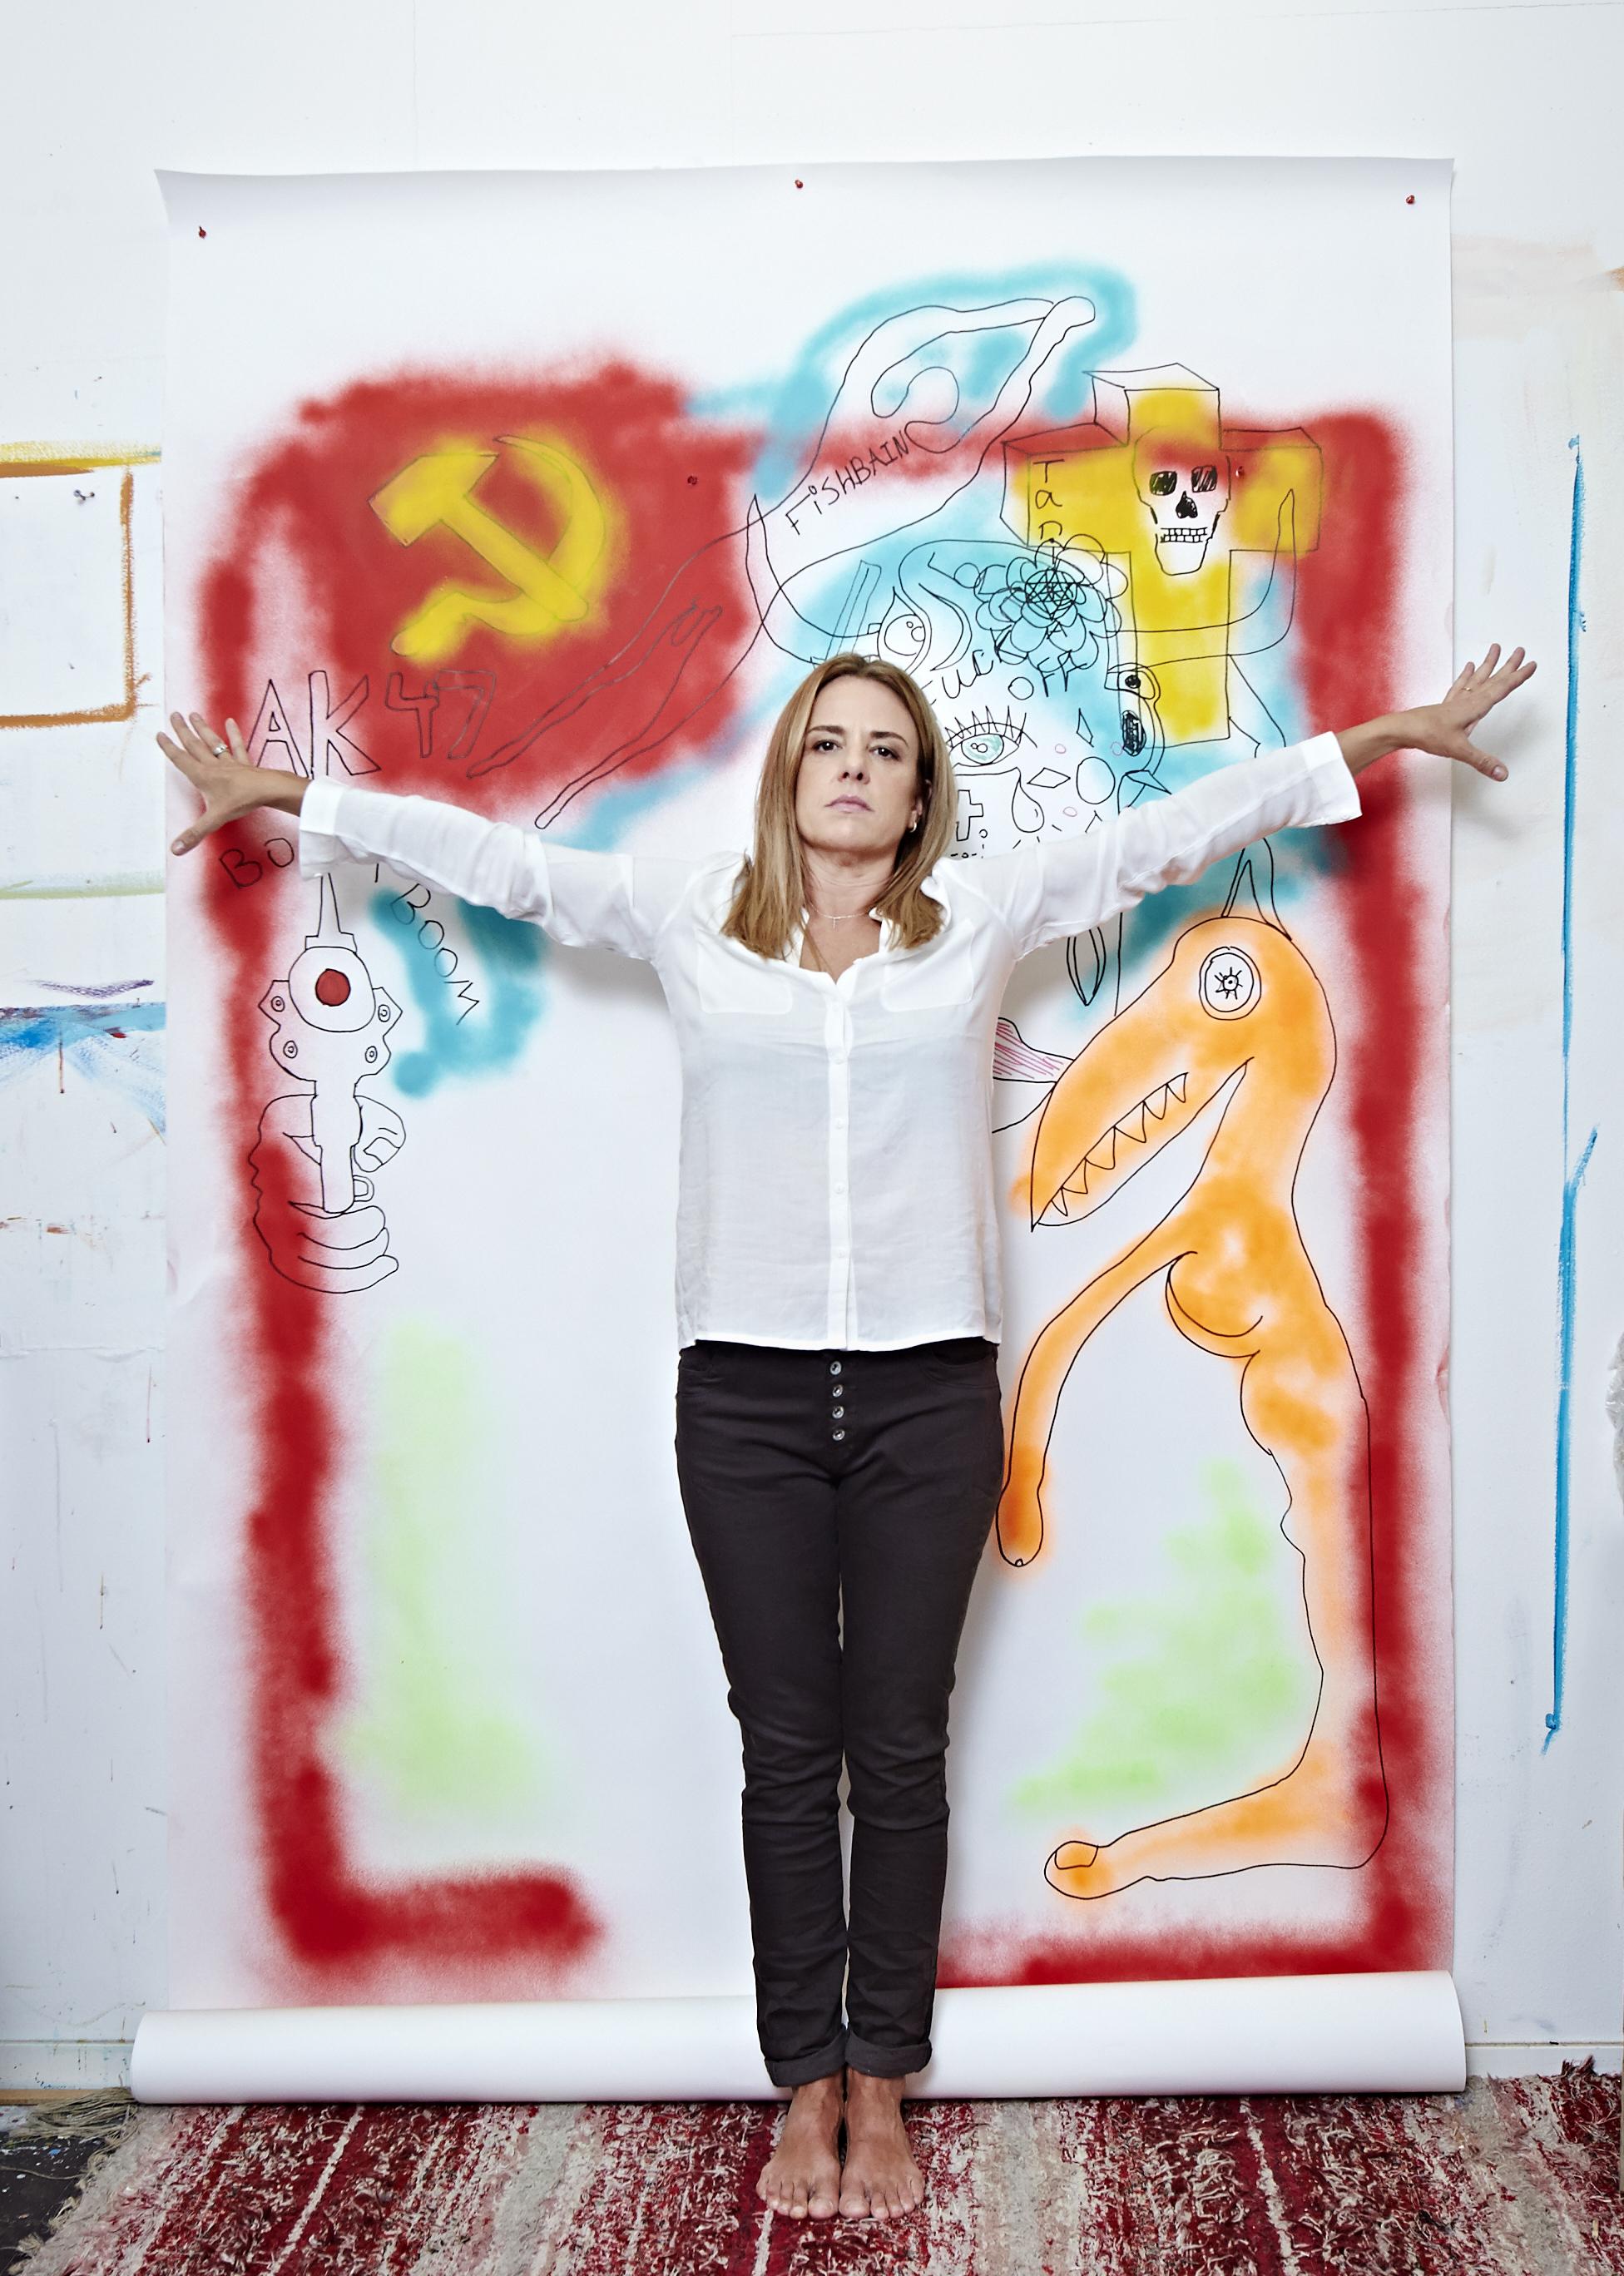 Tania Michelet